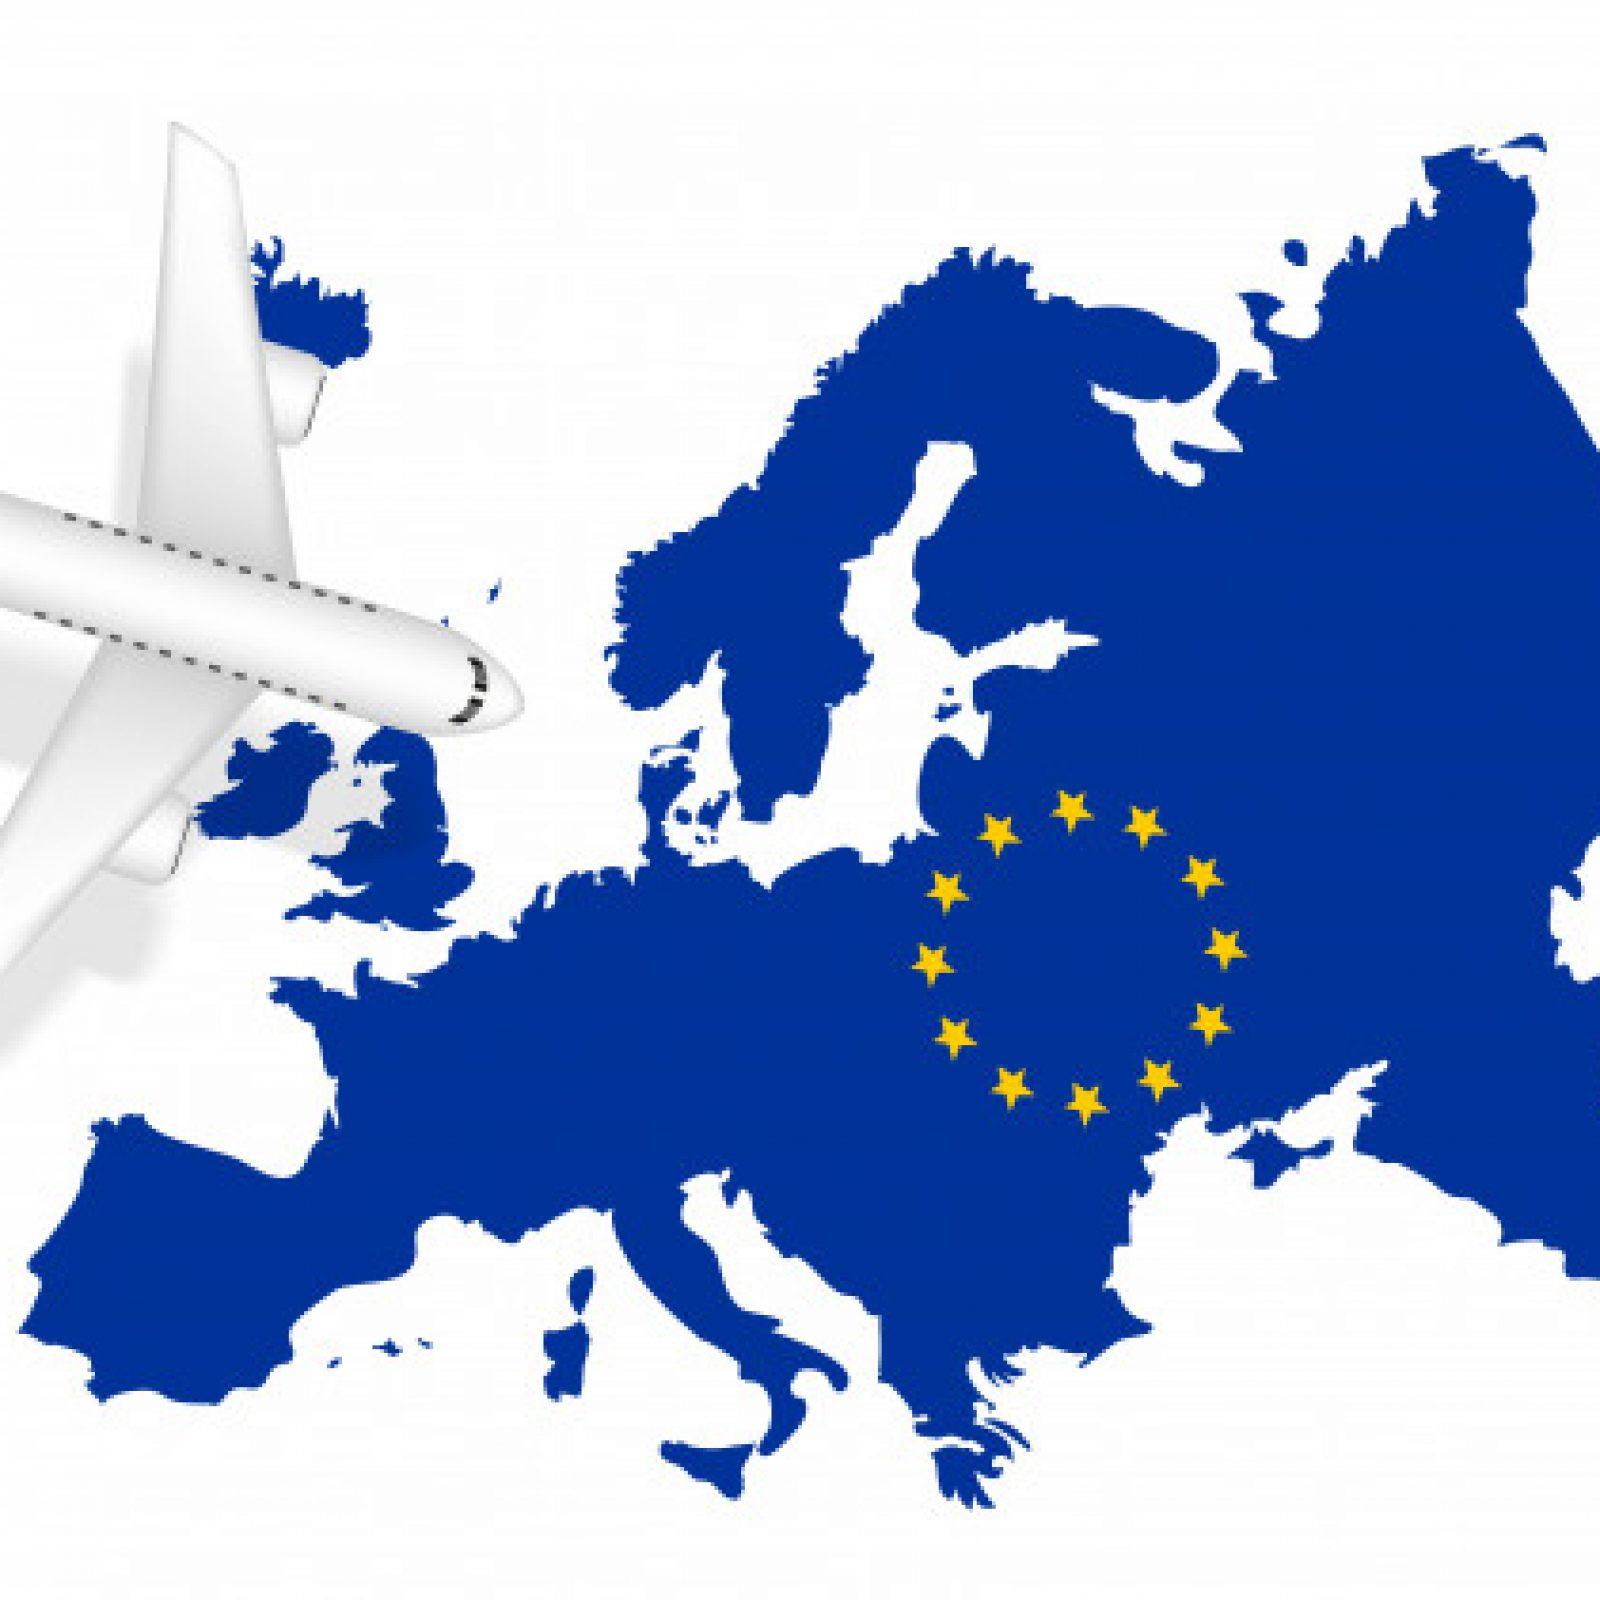 vuelo-avion-viaje-europa-mapa-europa_37787-323